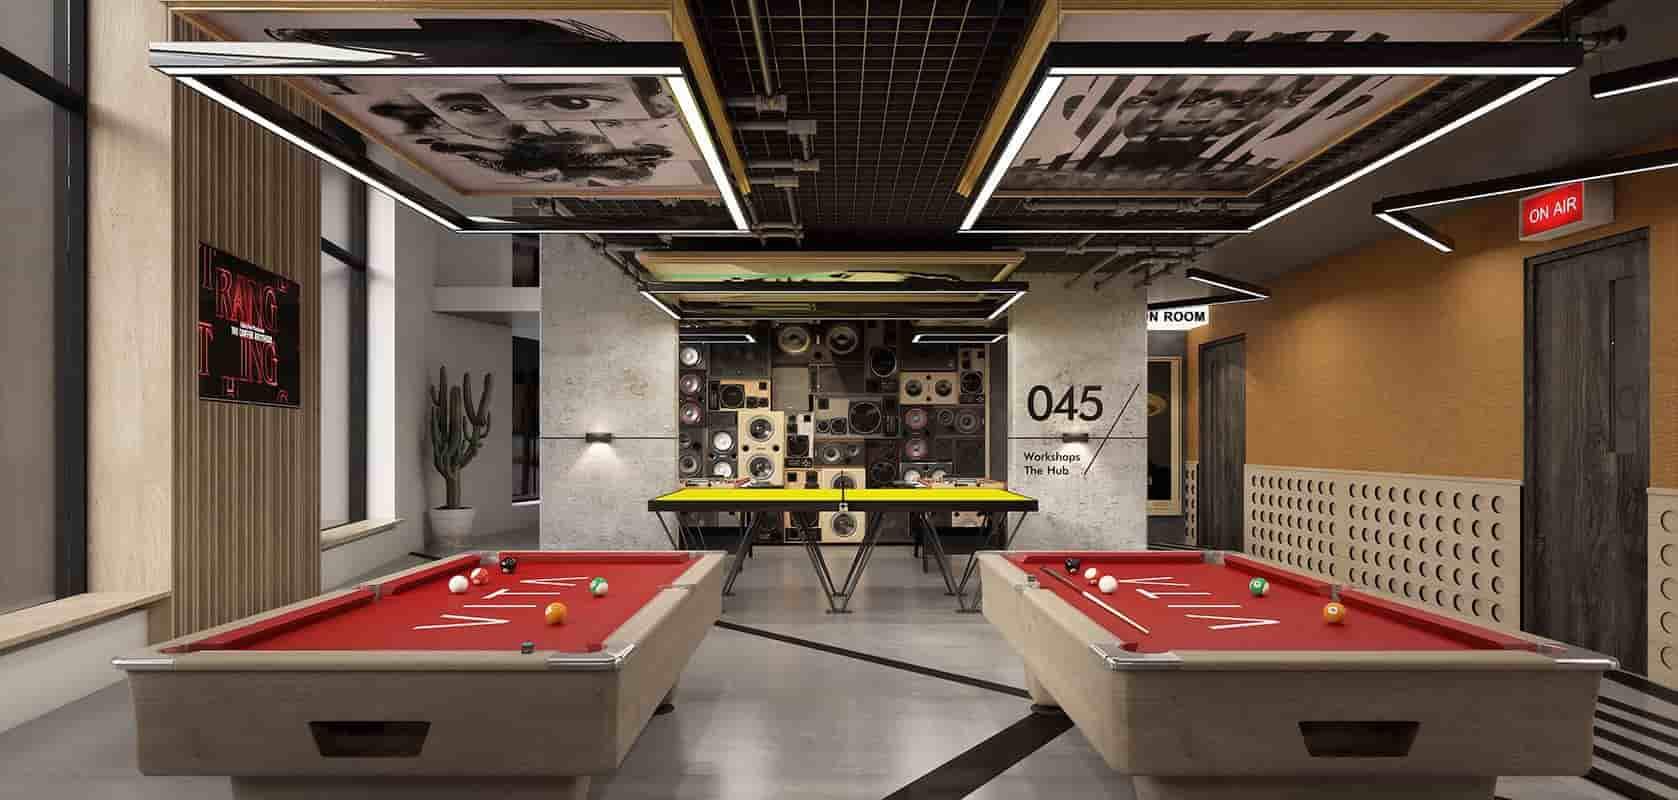 Vita-Student-Circle-Square-Manchester-Games-Room-1-Unilodgers